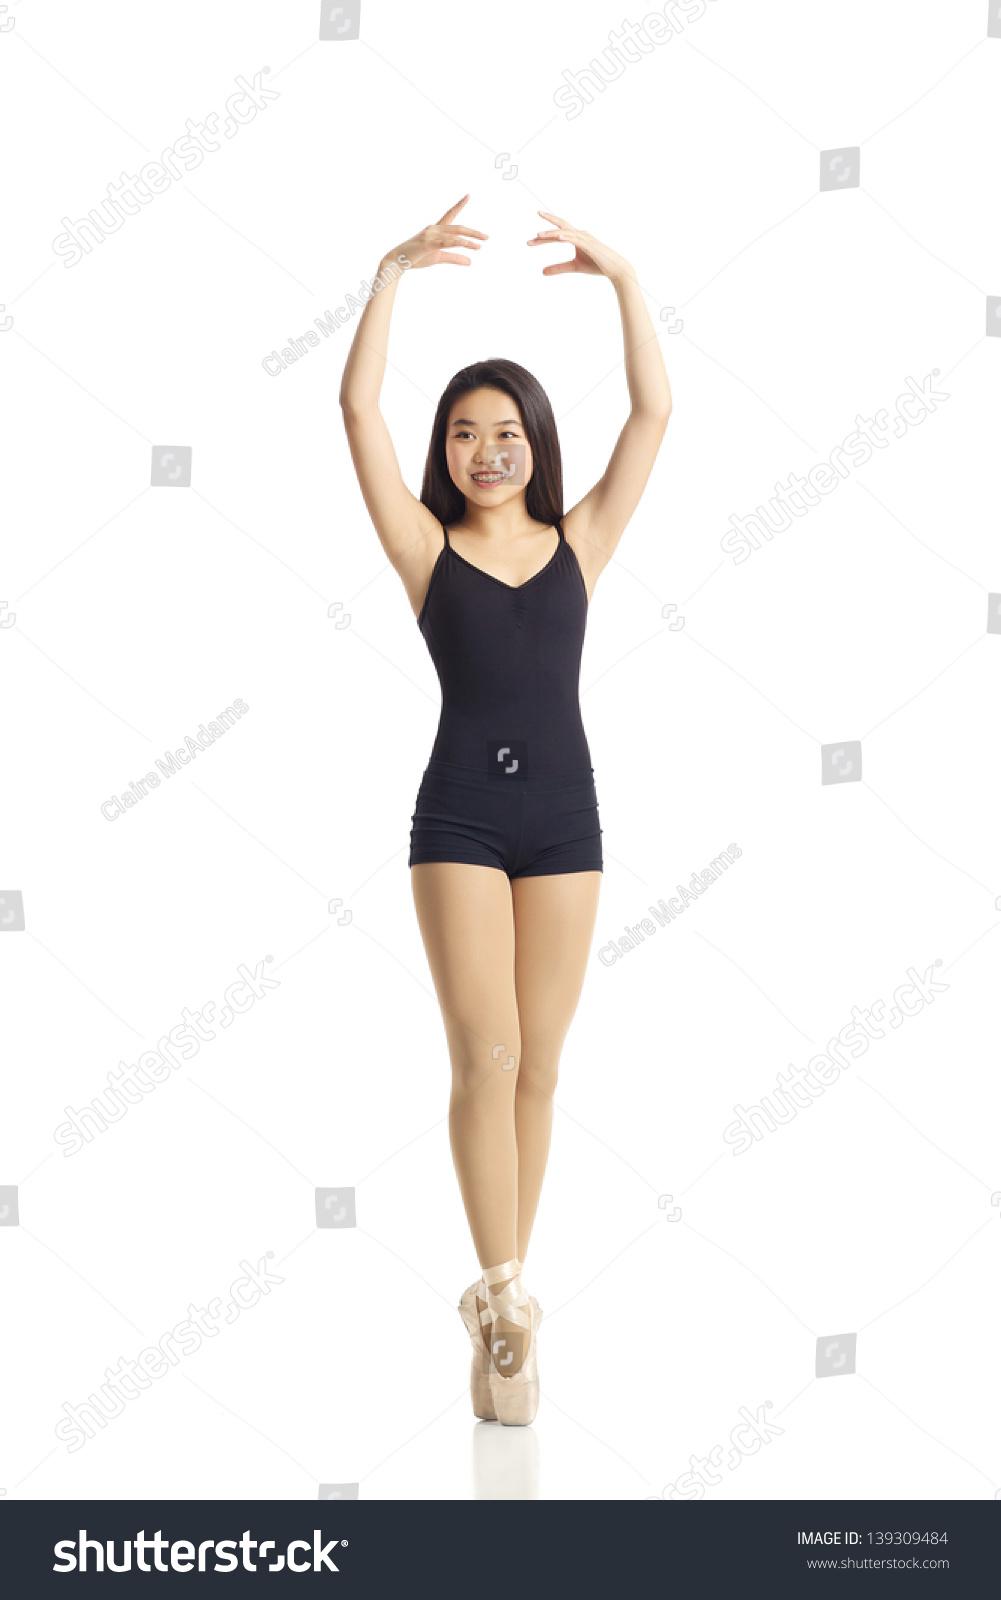 en teens body image.